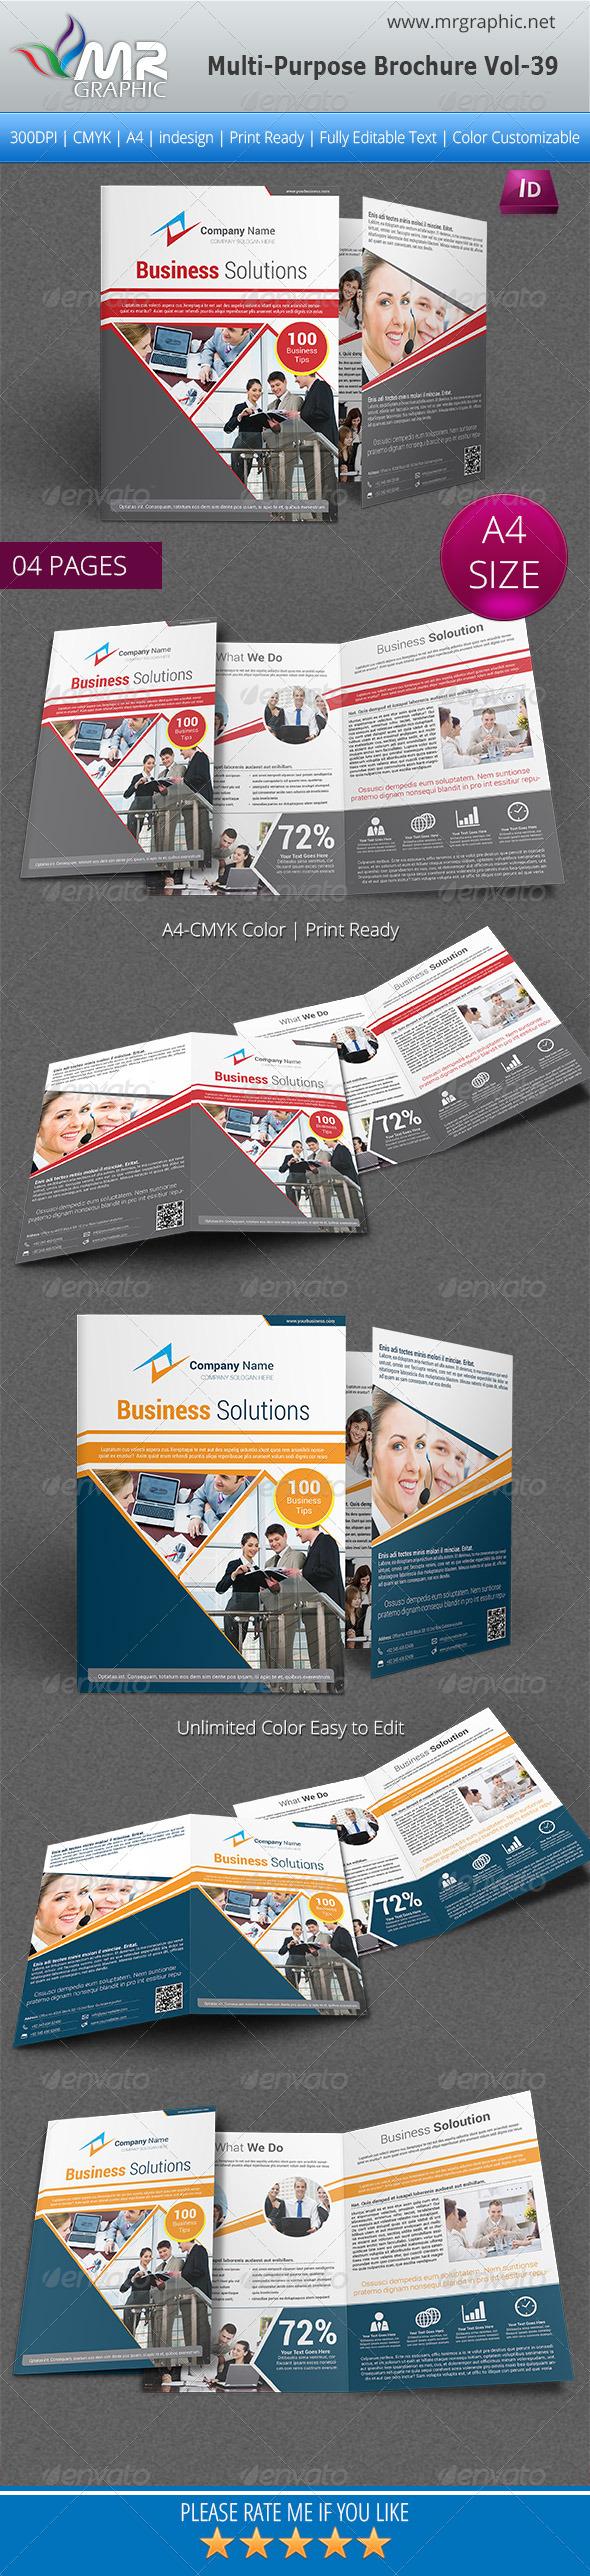 Multipurpose Bifold Brochure Template Vol-39 - Corporate Brochures